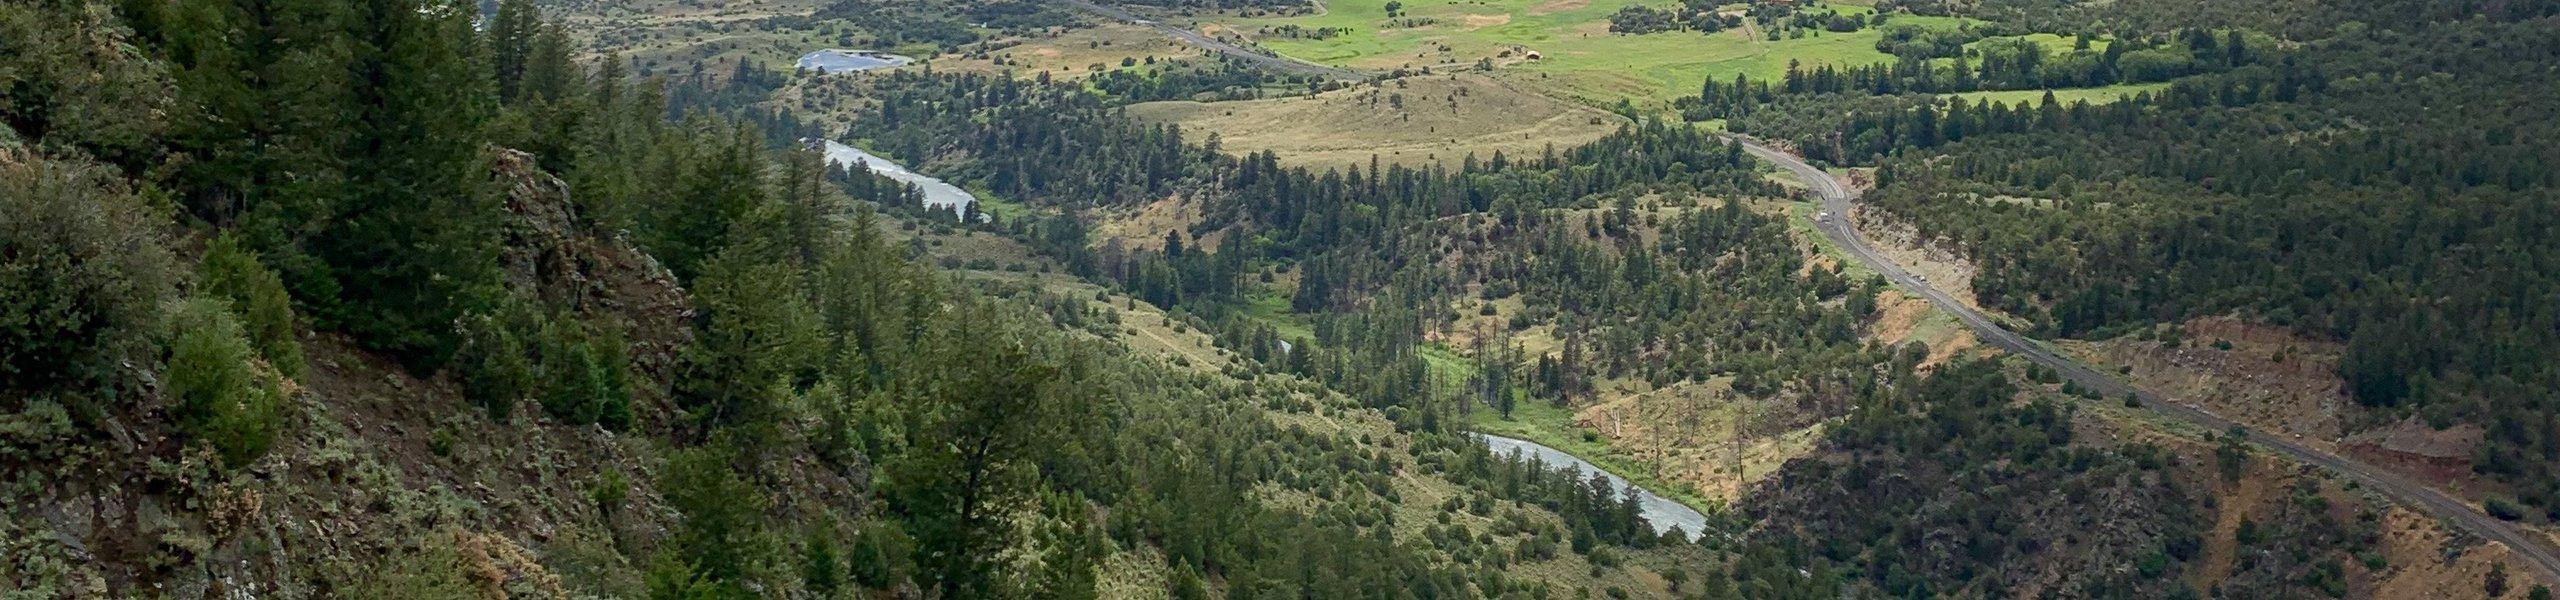 Middle Colorado River Pumphouse